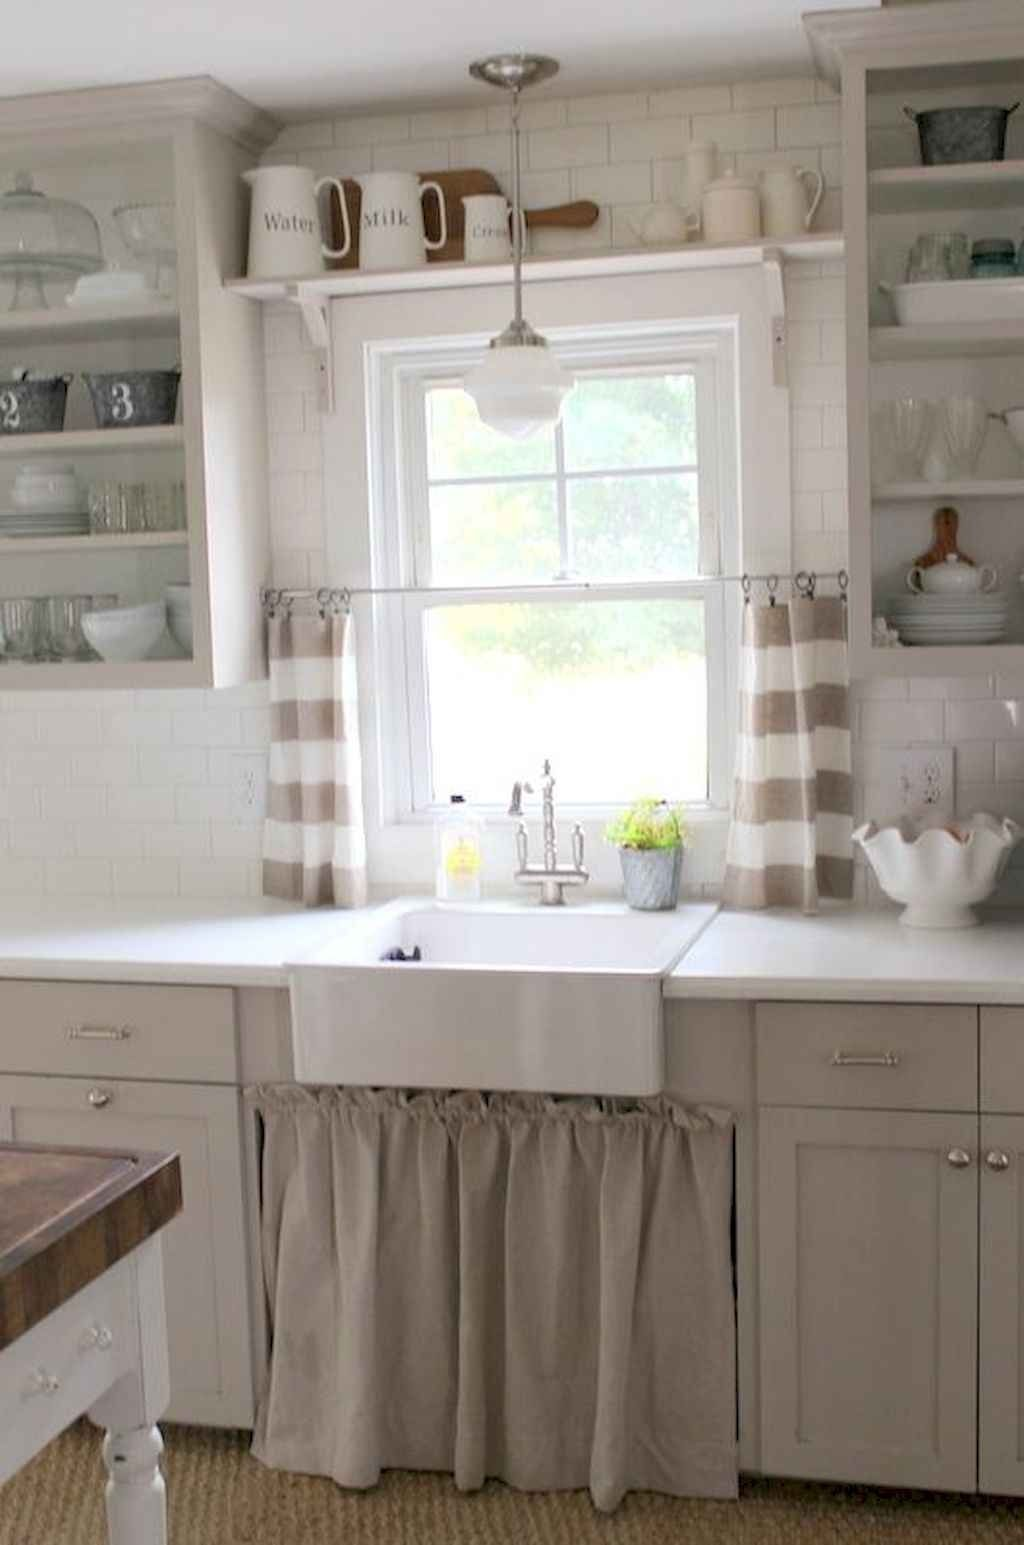 70 Pretty Farmhouse Kitchen Curtains Decor Ideas 68 farmhouse #70 #pretty #farmhouse #kitchen #curtains #decor #ideas #68